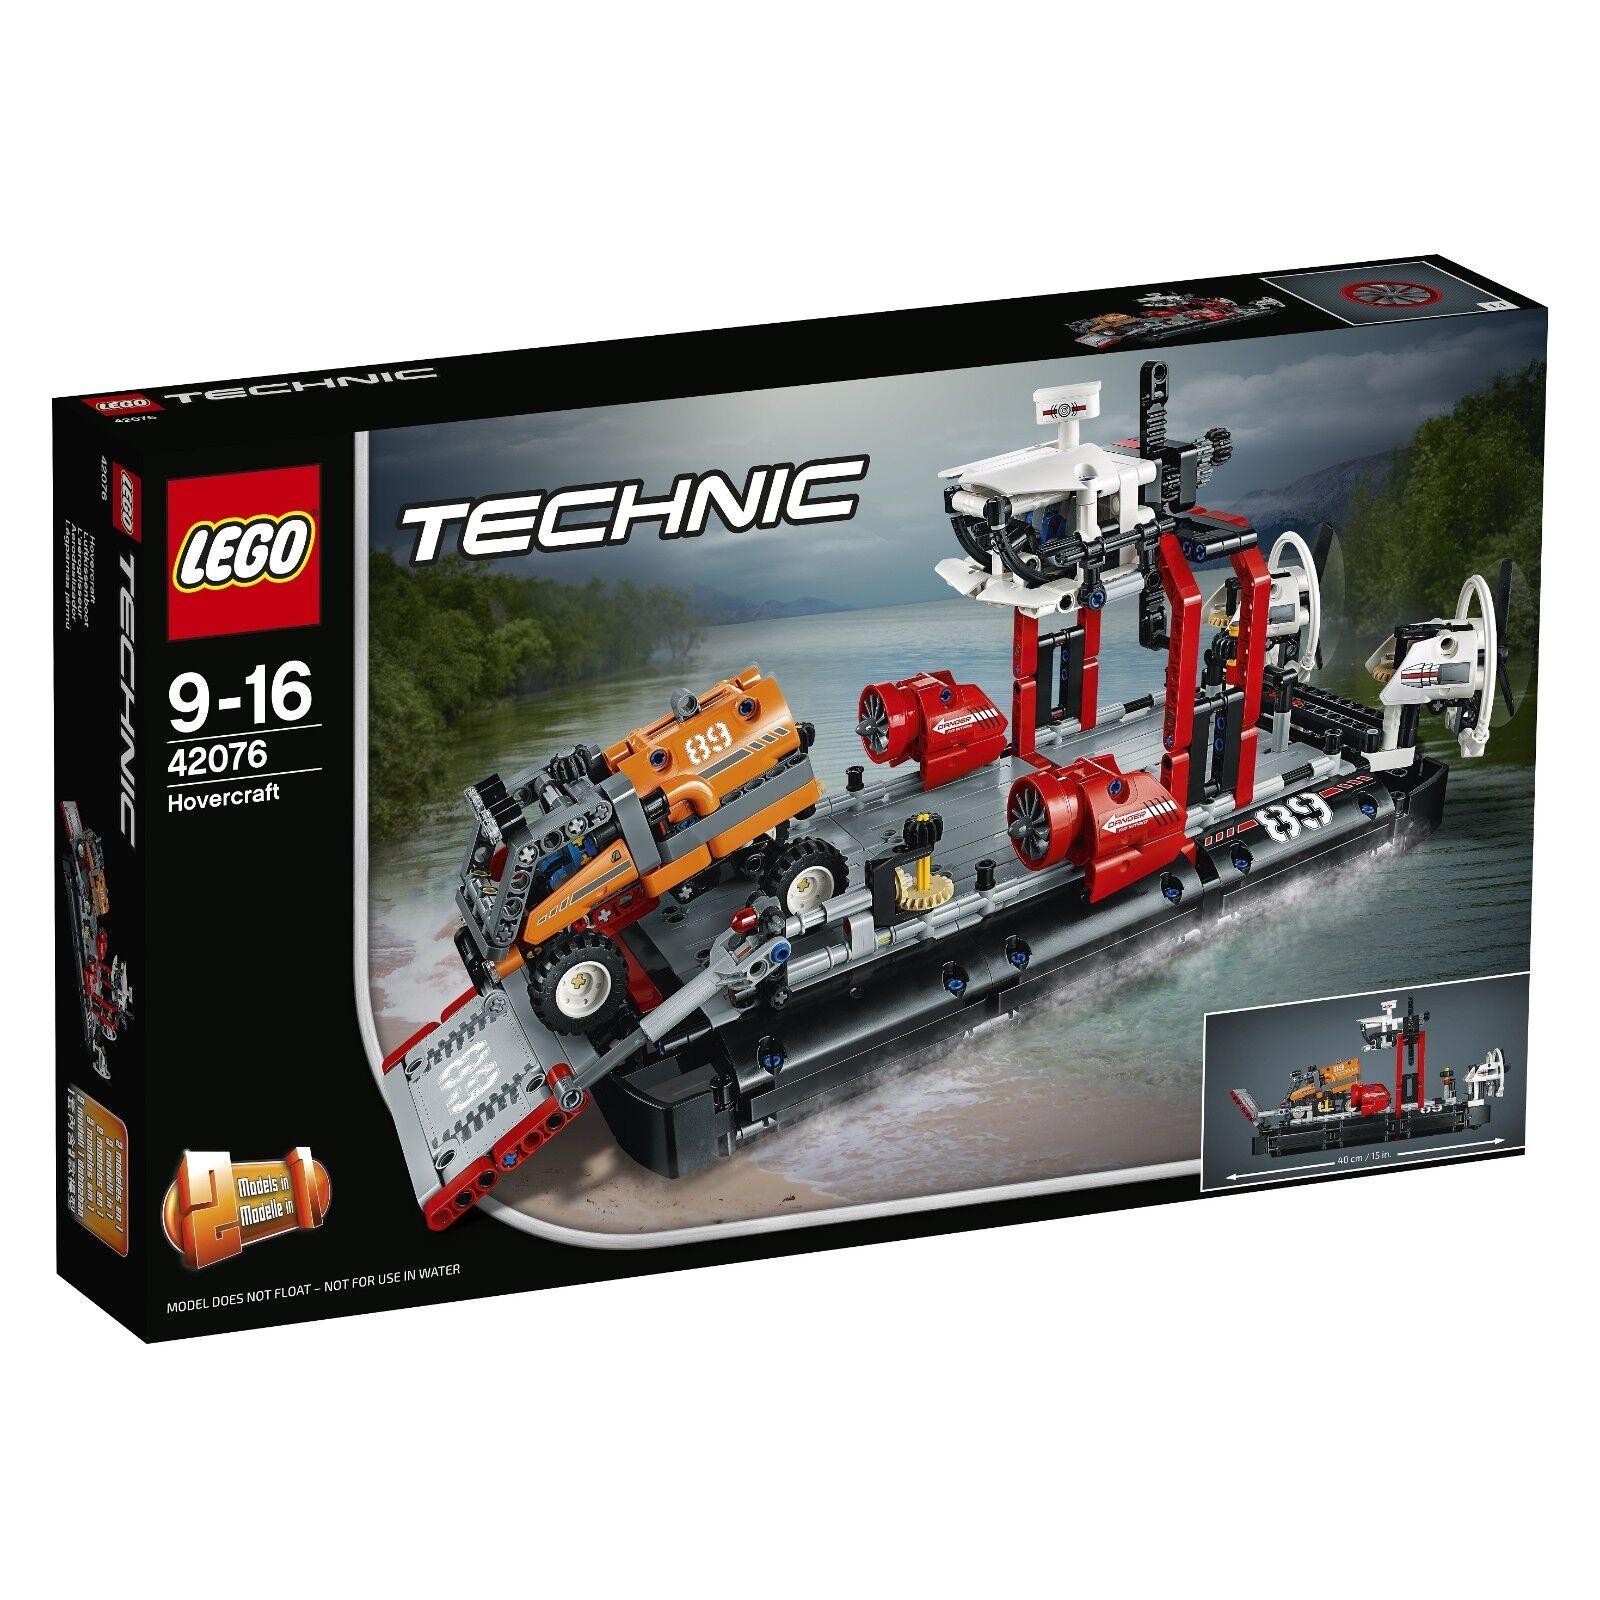 LEGO 42076 Hovercraft - TECHNIC 9-16 Pz 1020